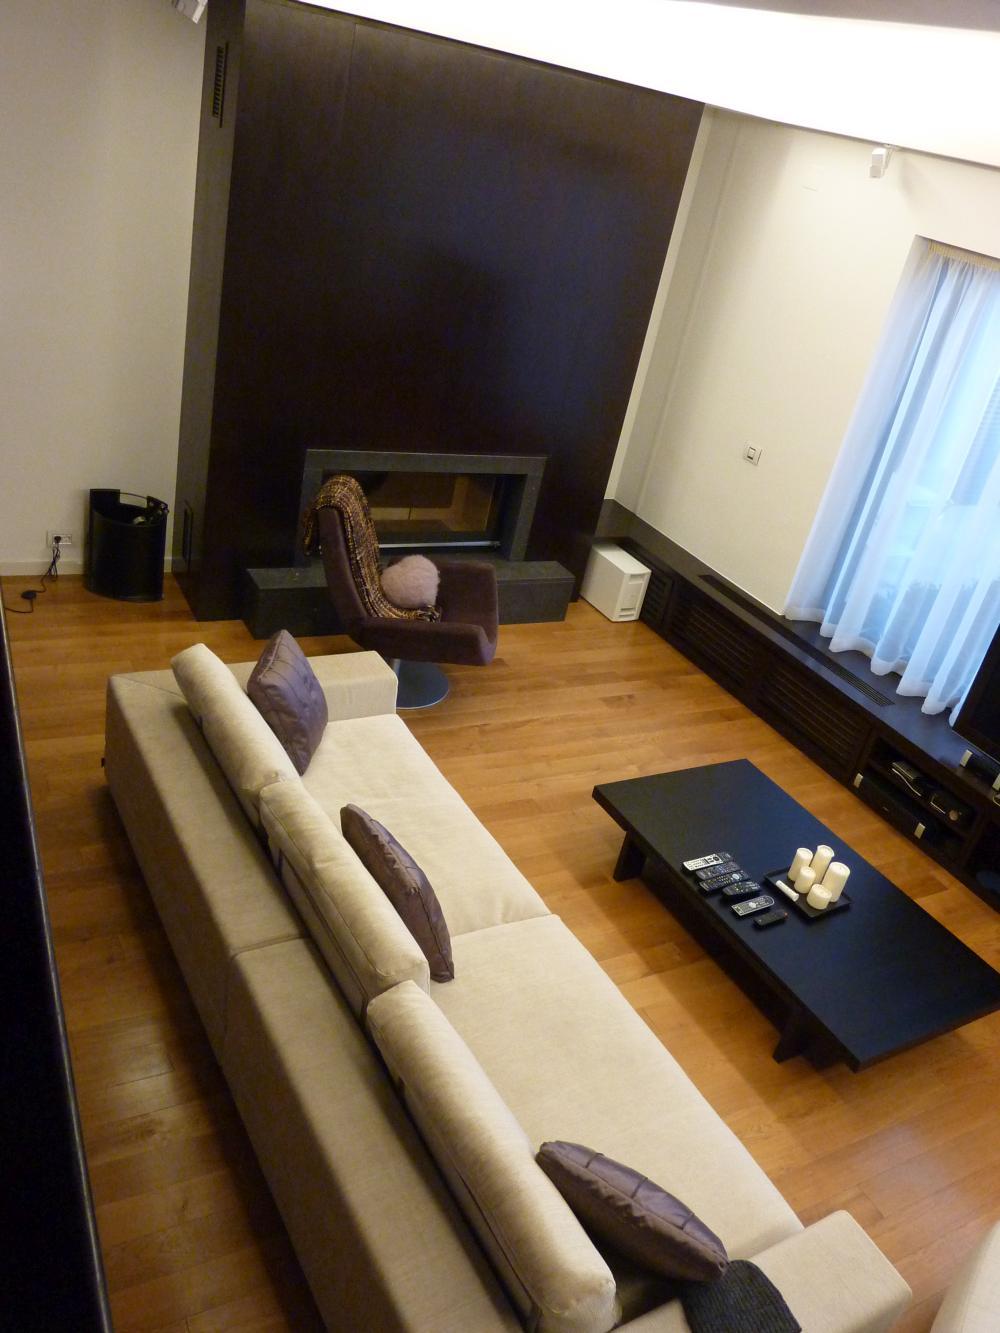 https://nbc-arhitect.ro/wp-content/uploads/2020/11/NBC-ARHITECT-_-residential-_-Tudor-House-_-Romania_33.jpg